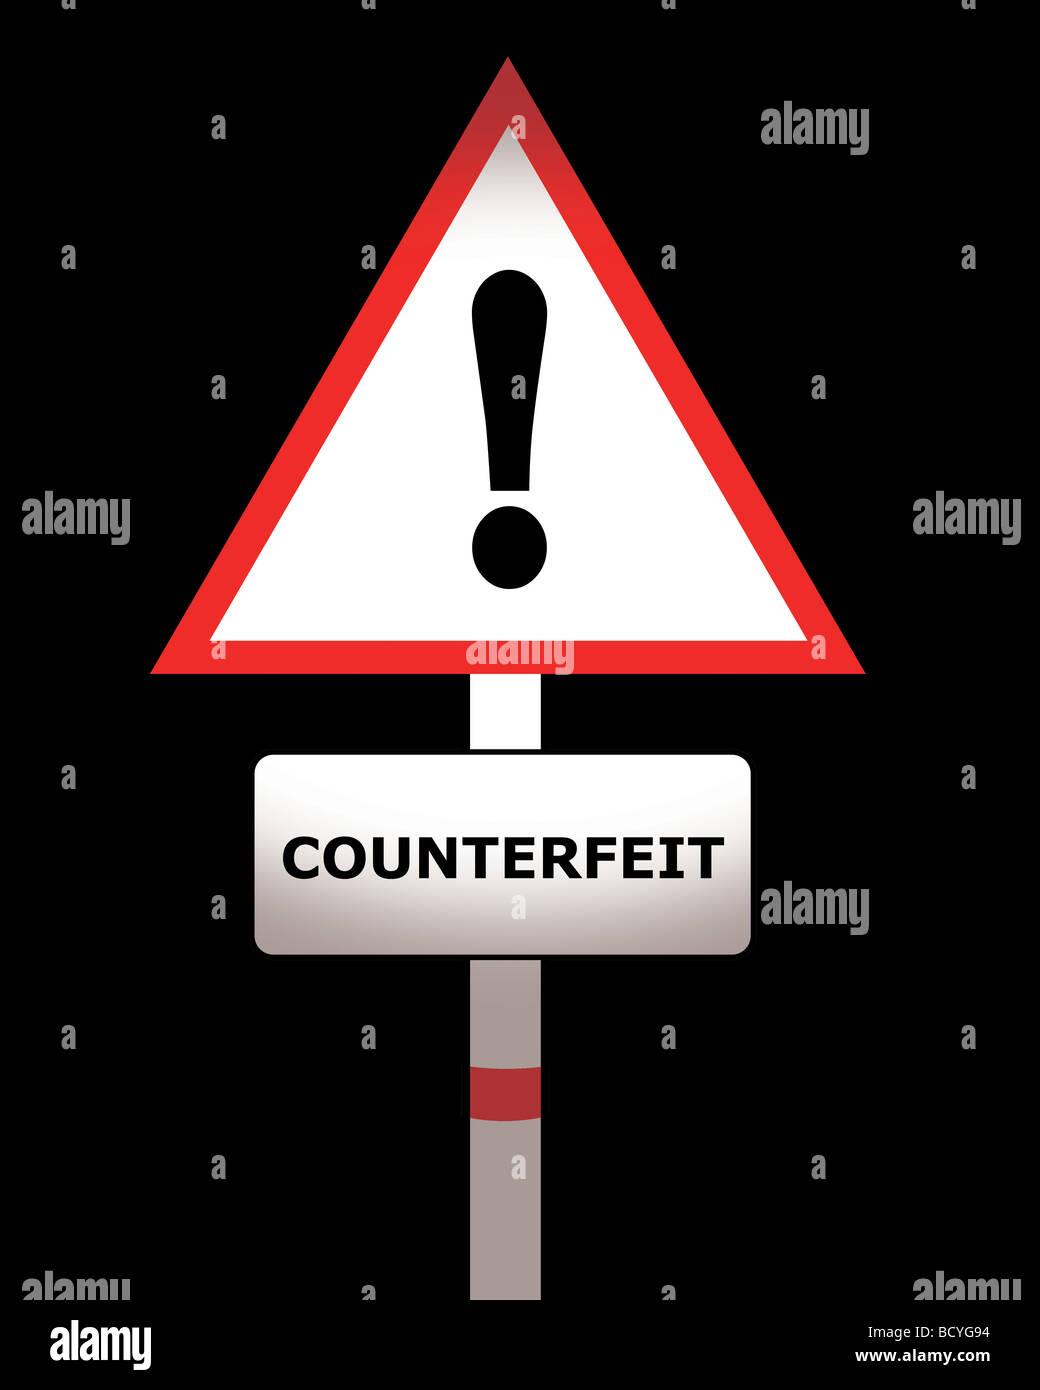 counterfeit - Stock Image